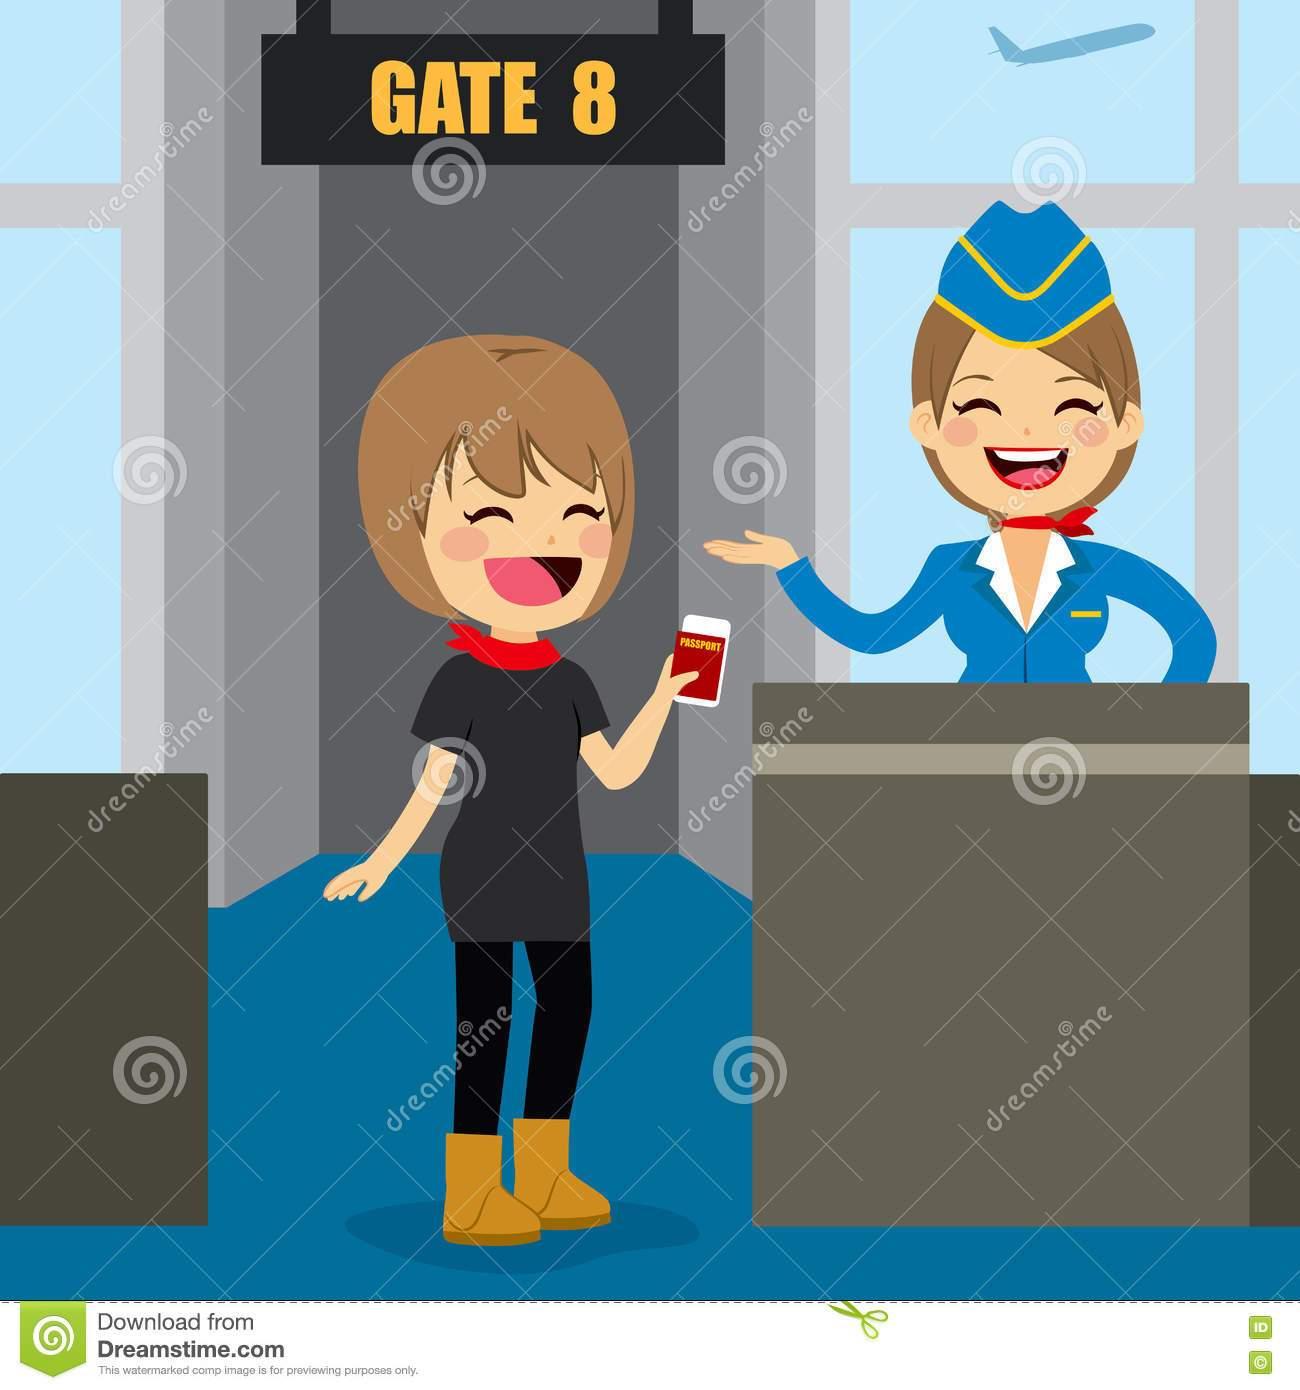 Airport gate clipart 3 » Clipart Portal.